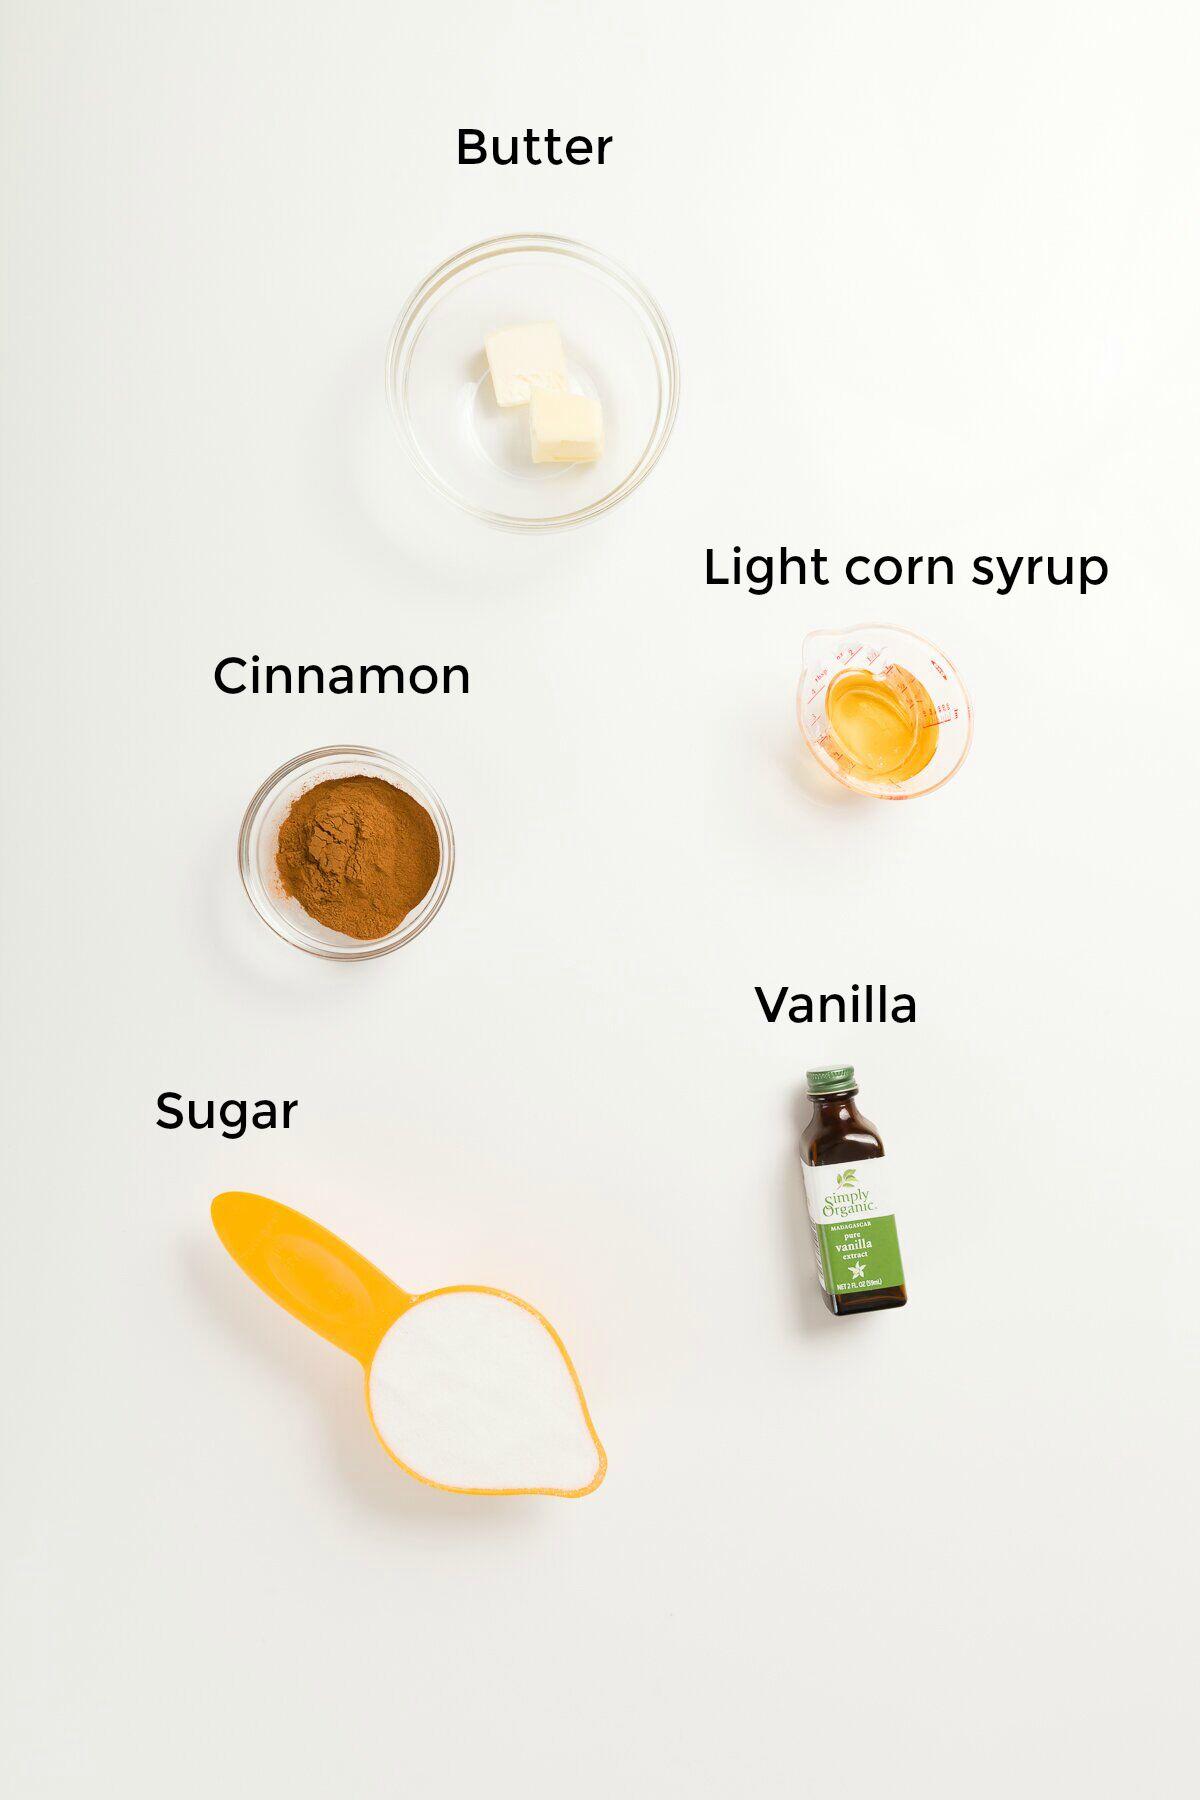 Labeled ingredient shot of a cinnamon chip ingredients